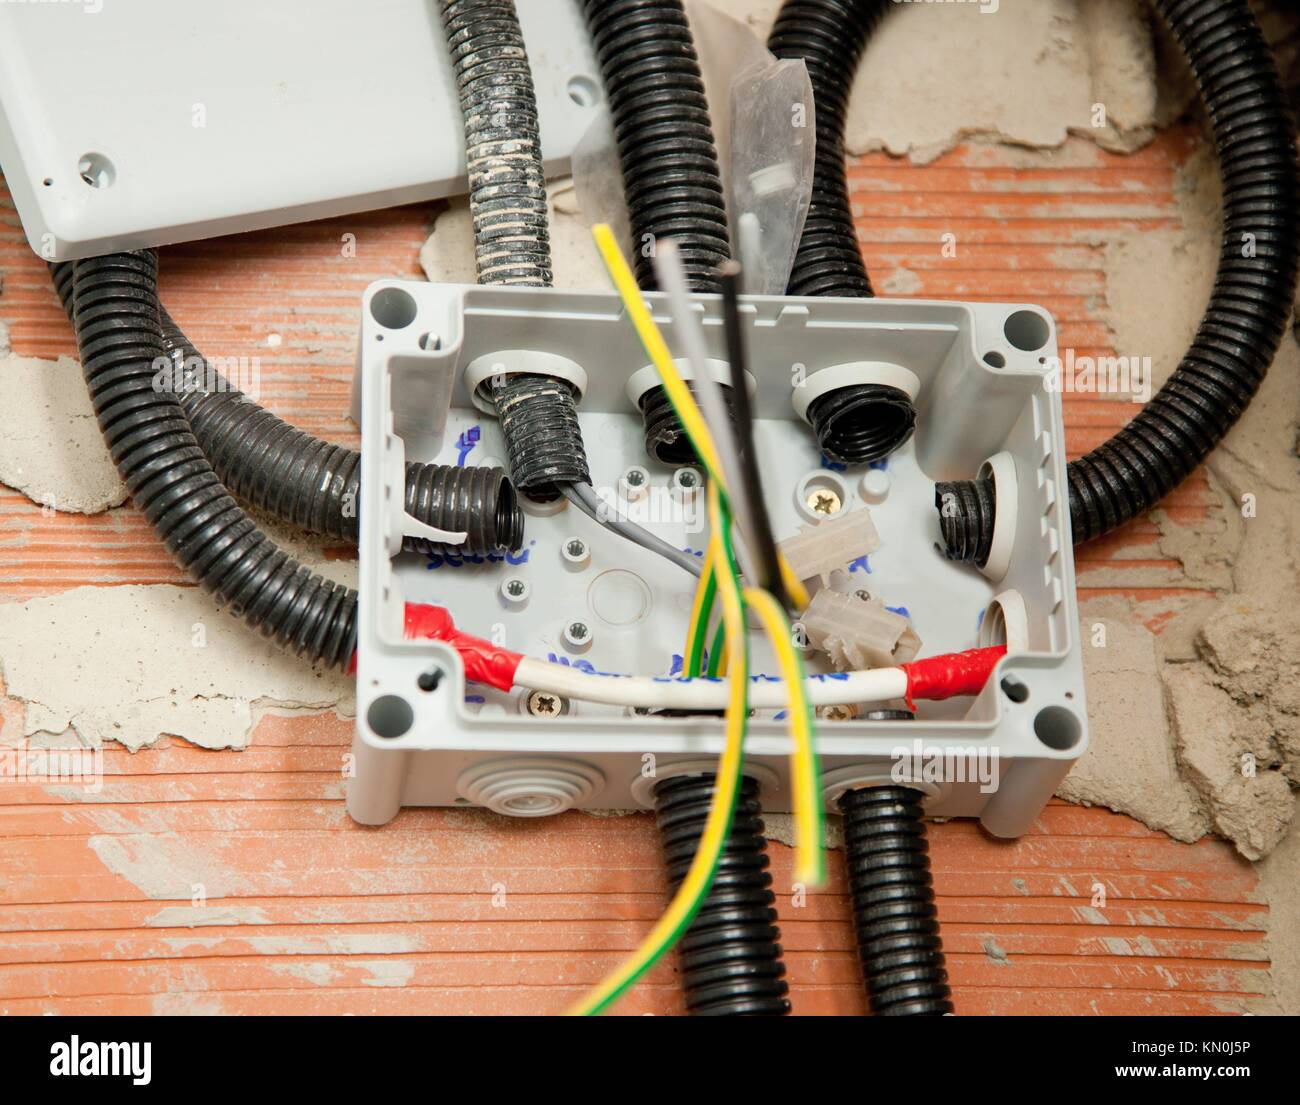 Conduit Box Stockfotos & Conduit Box Bilder - Alamy